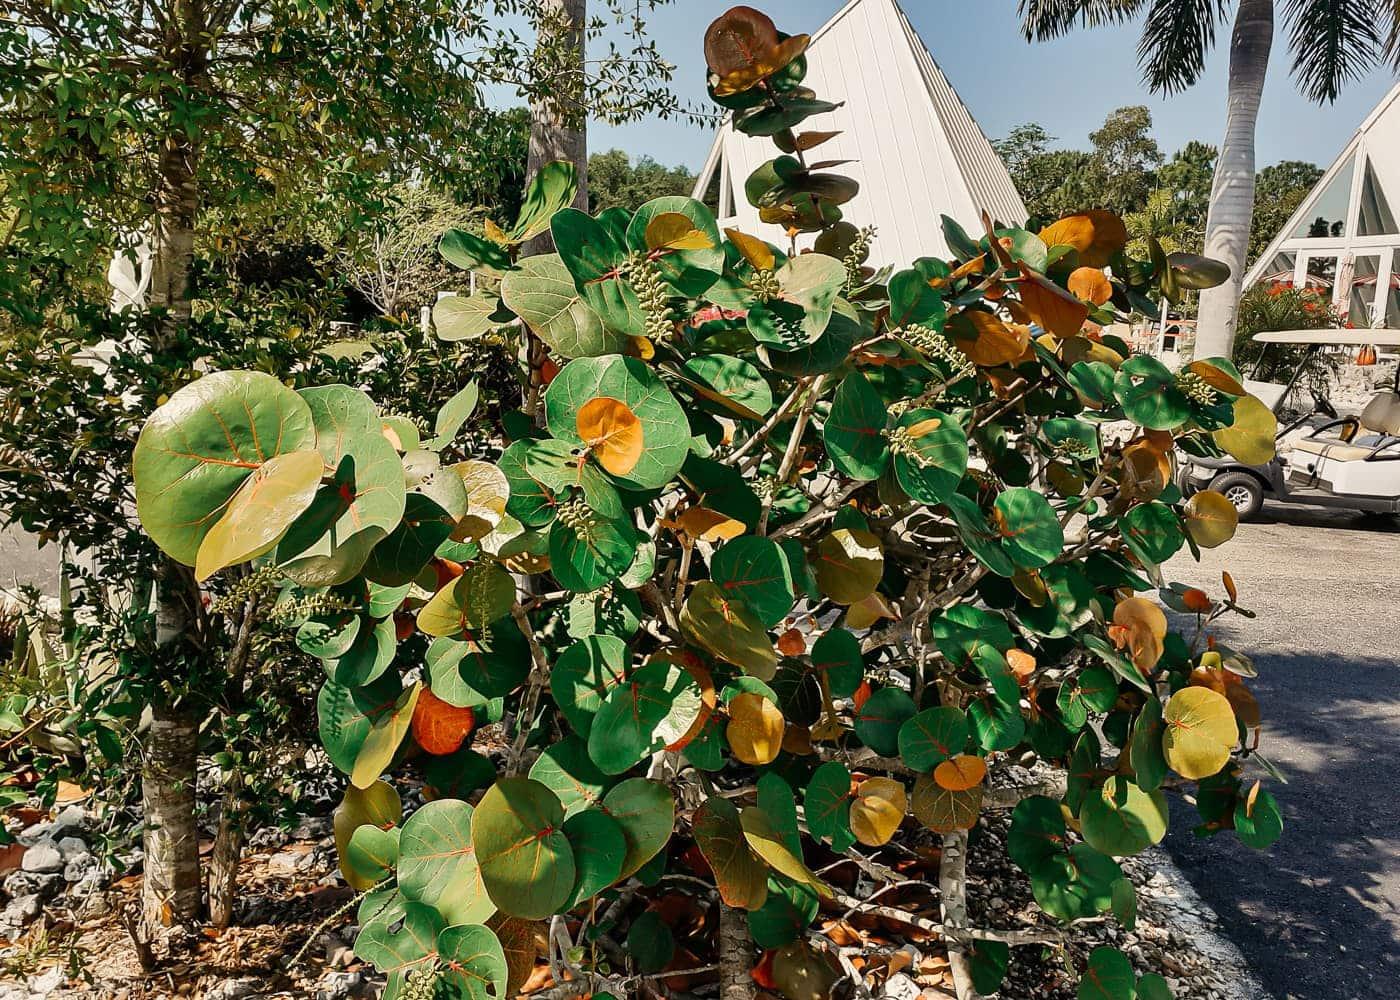 PyramidsinFlorida Sea Grape